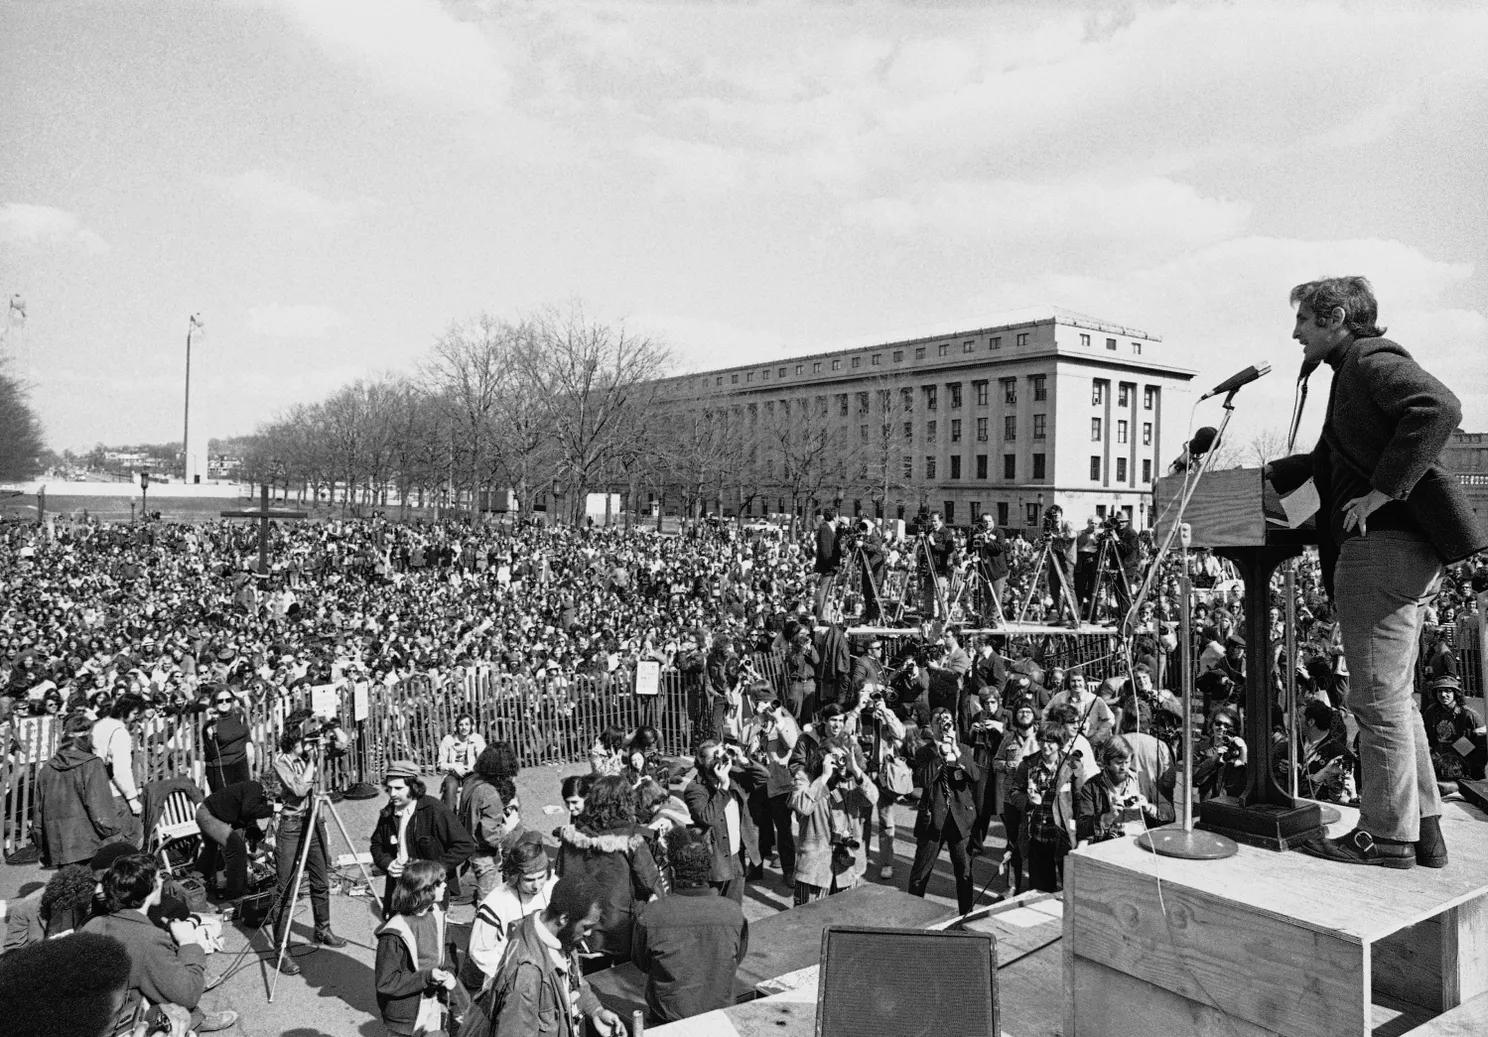 Daniel Ellsberg, chief defendant in the Pentagon Papers case, addresses an anti-war crowd in Harrisburg, Pa., on April 1, 1972. RUSTY KENNEDY, AP